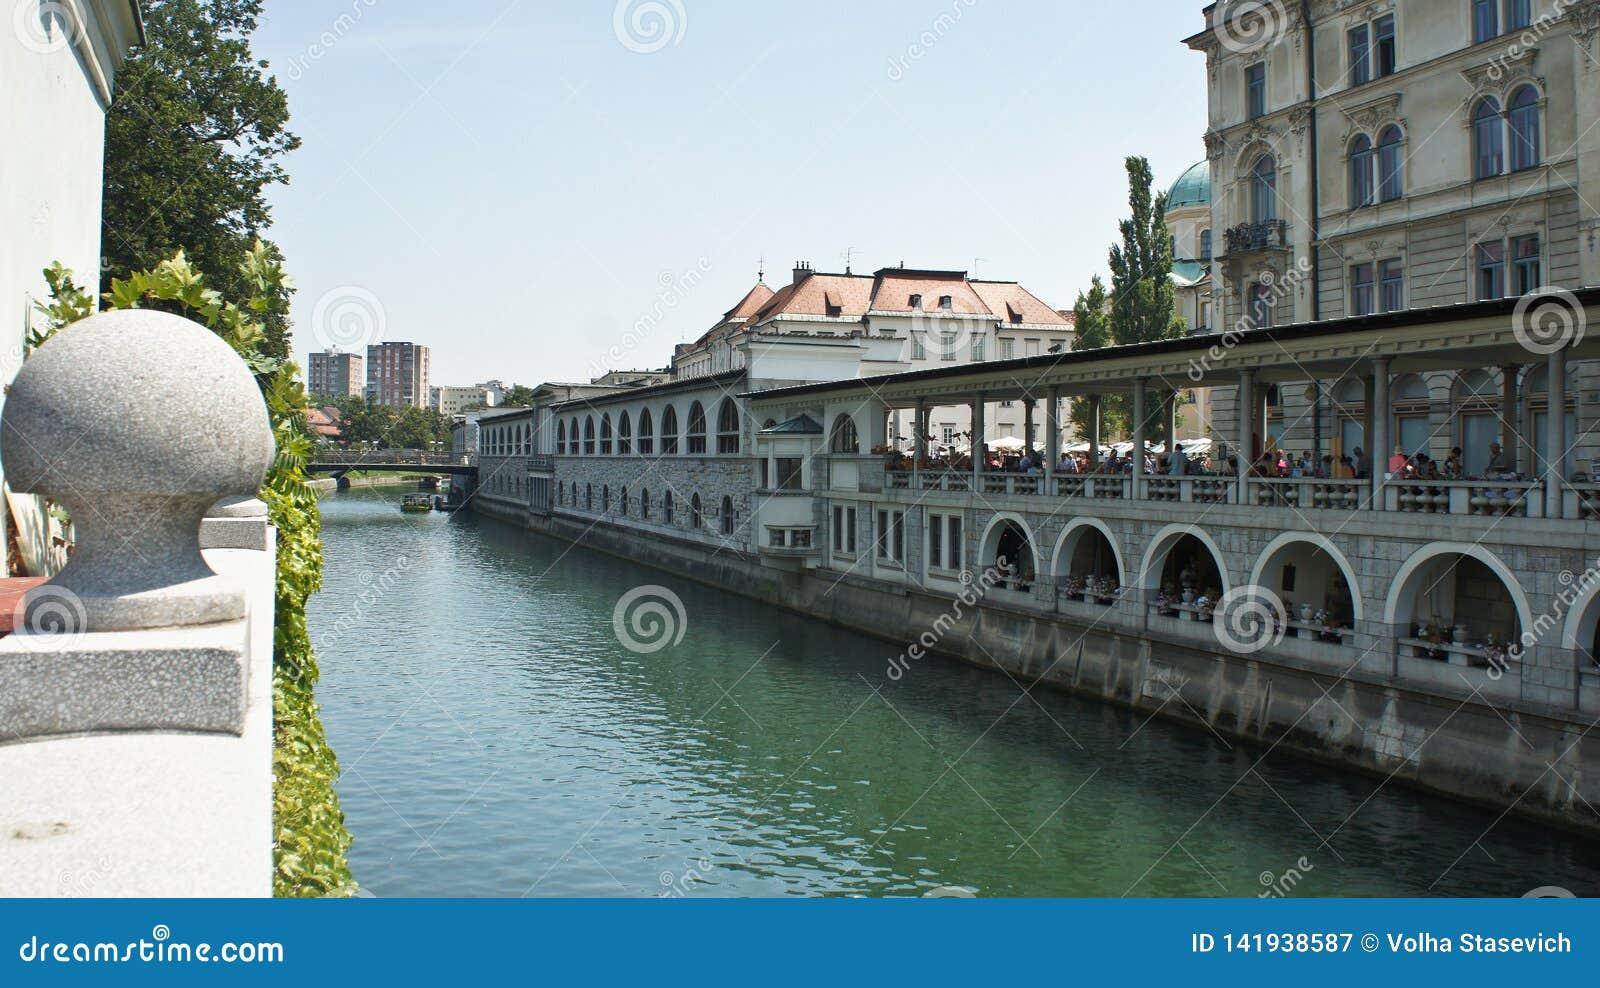 View of the Ljubljanica river in old town, beautiful architecture, sunny day, Ljubljana, Slovenia